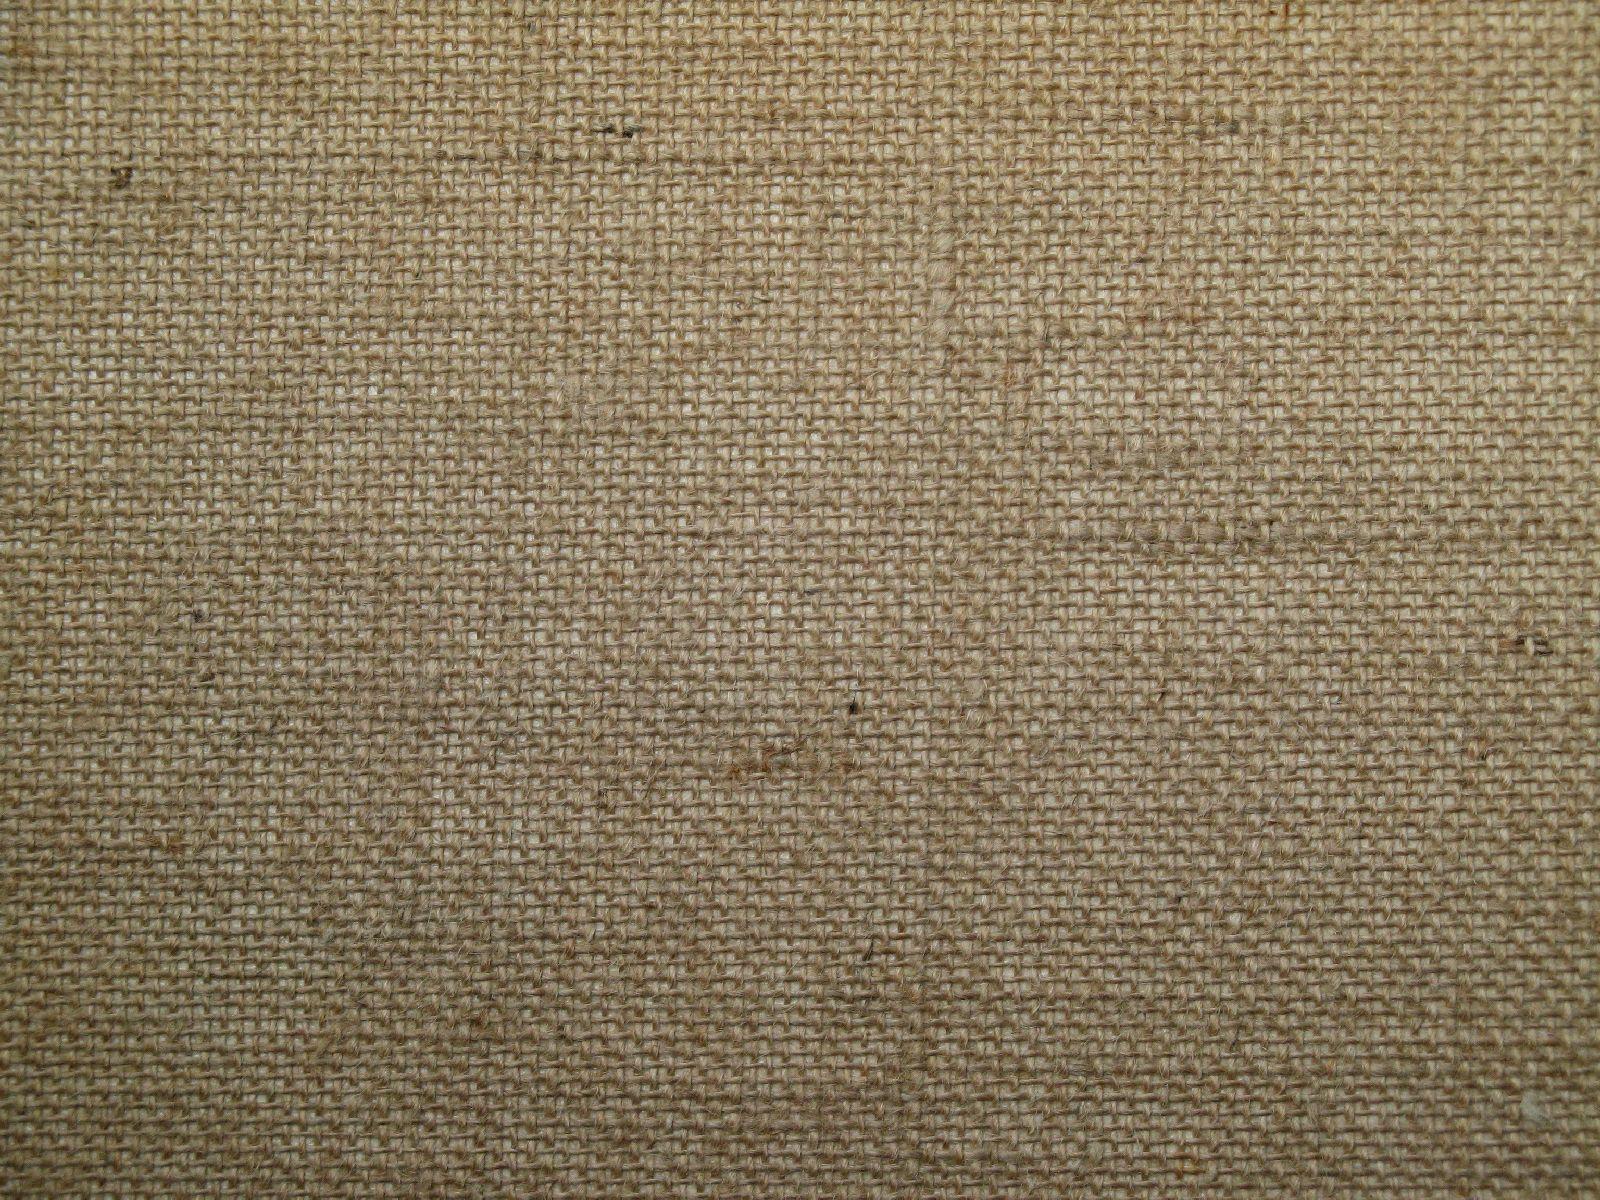 Innenraum-Material_Textur_B_0436